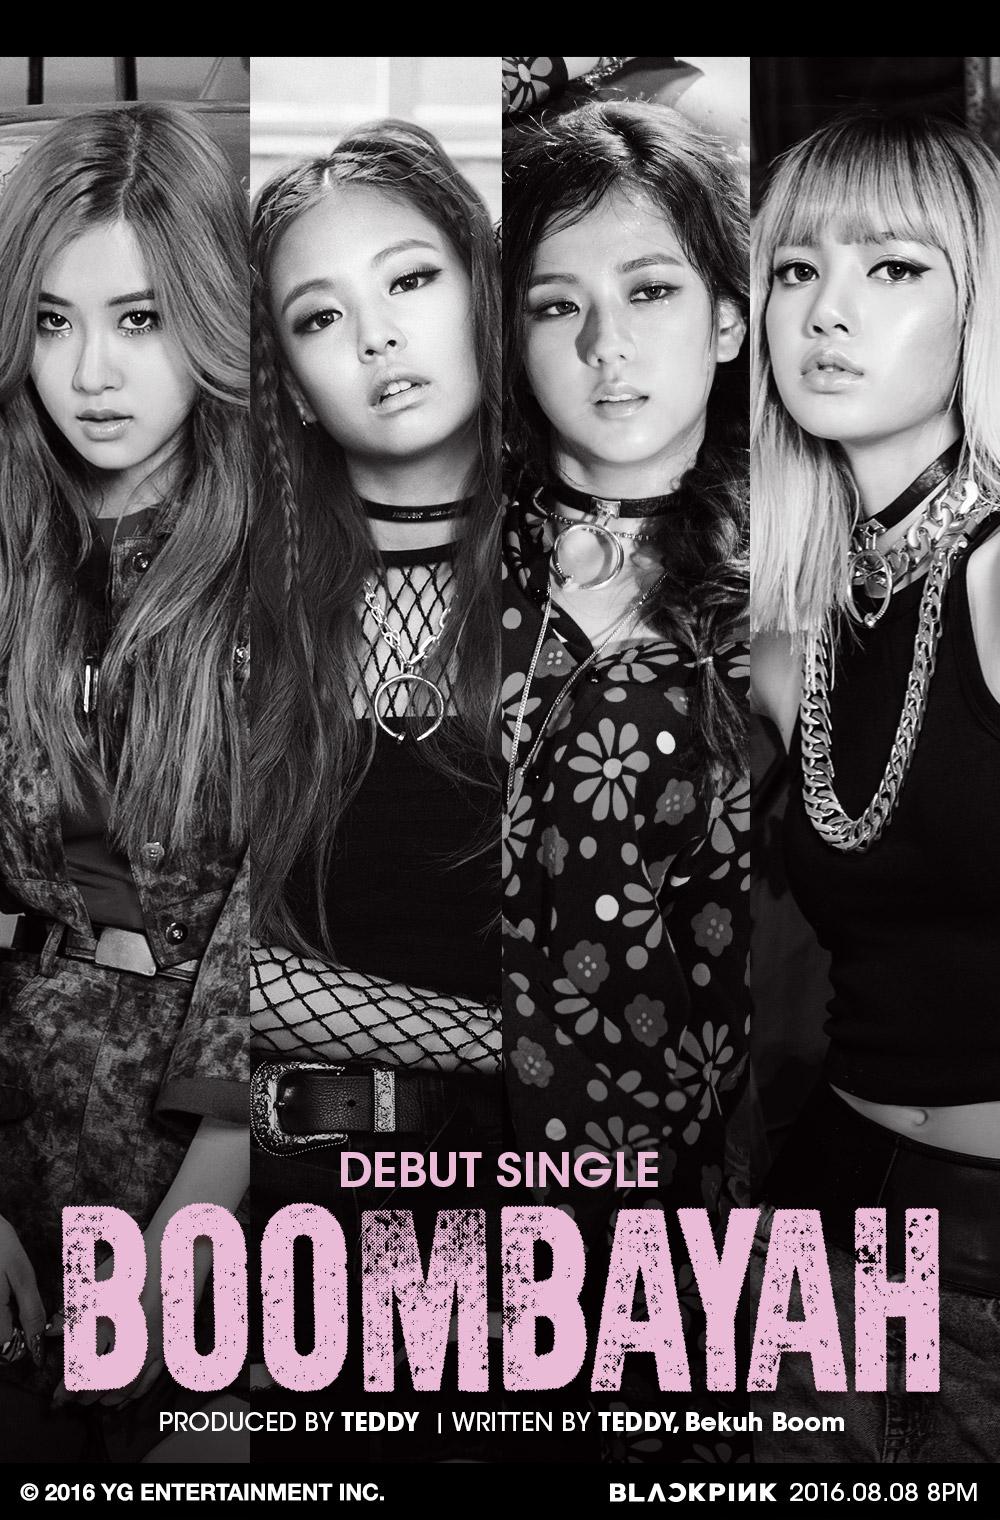 BLACKPINK Boombayah teaser